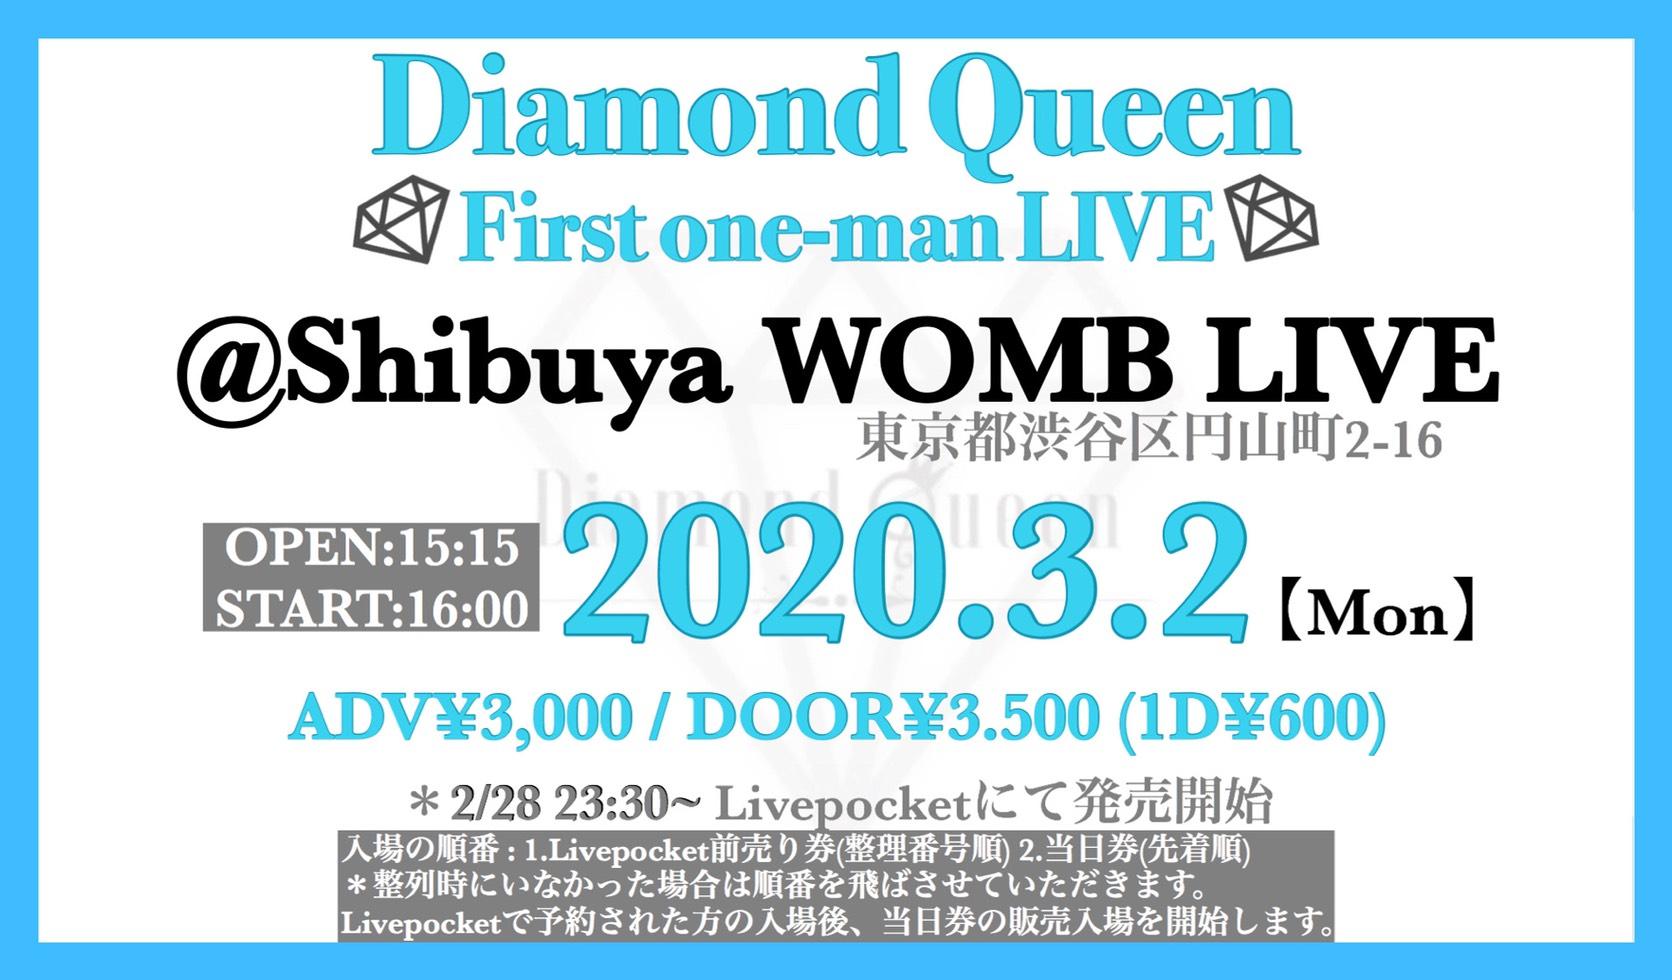 Diamond Queen  First one-man LIVE